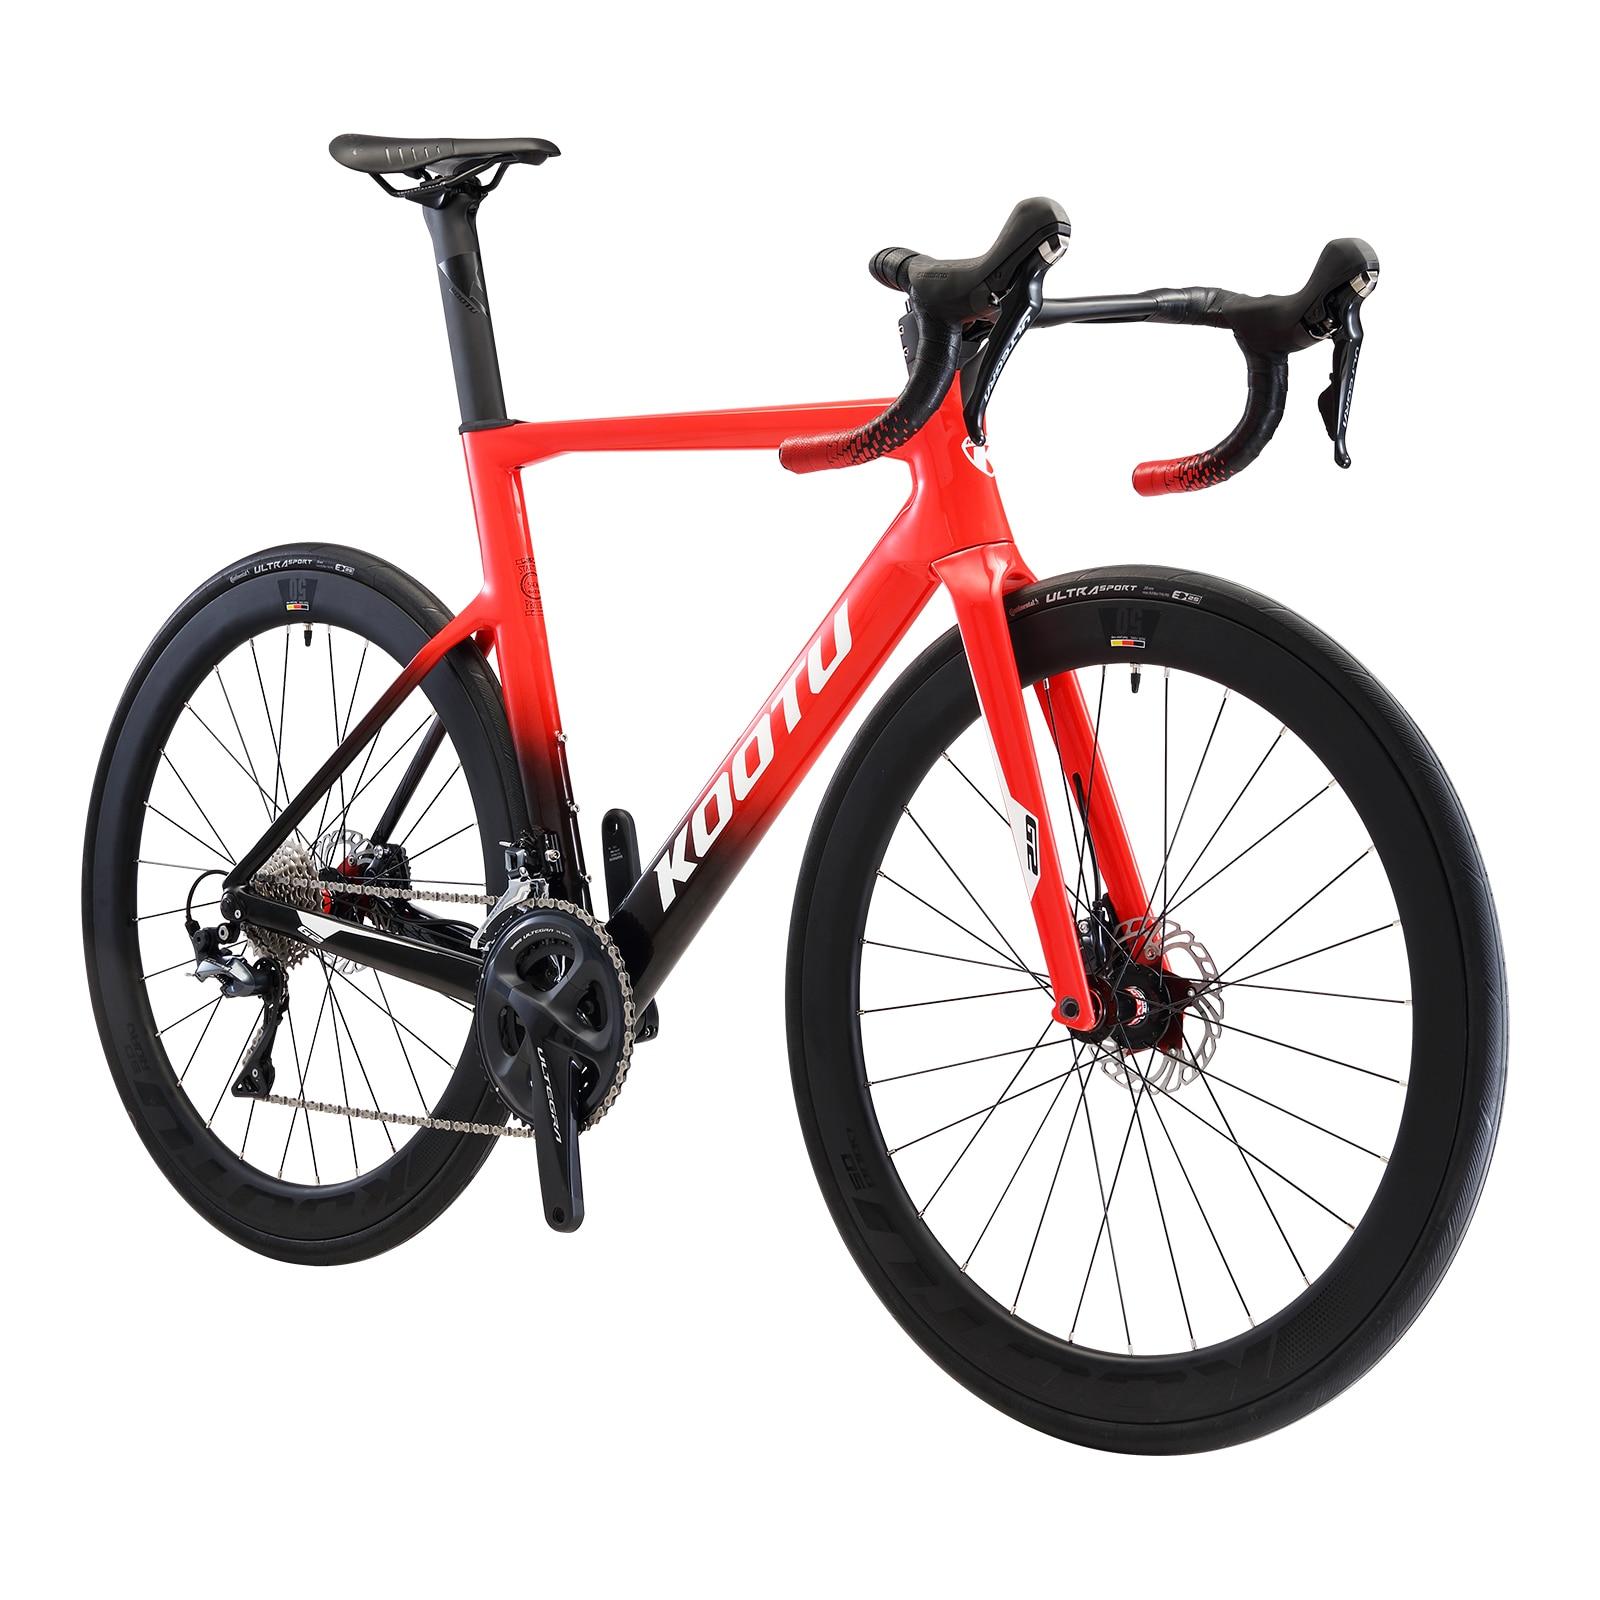 KOOTU T800 Carbon Fiber Road Bike Race Gravel Bike 22speed Shimano R8020 Disc Brake Racing Bike 8.8 kg Carbon Bicycle